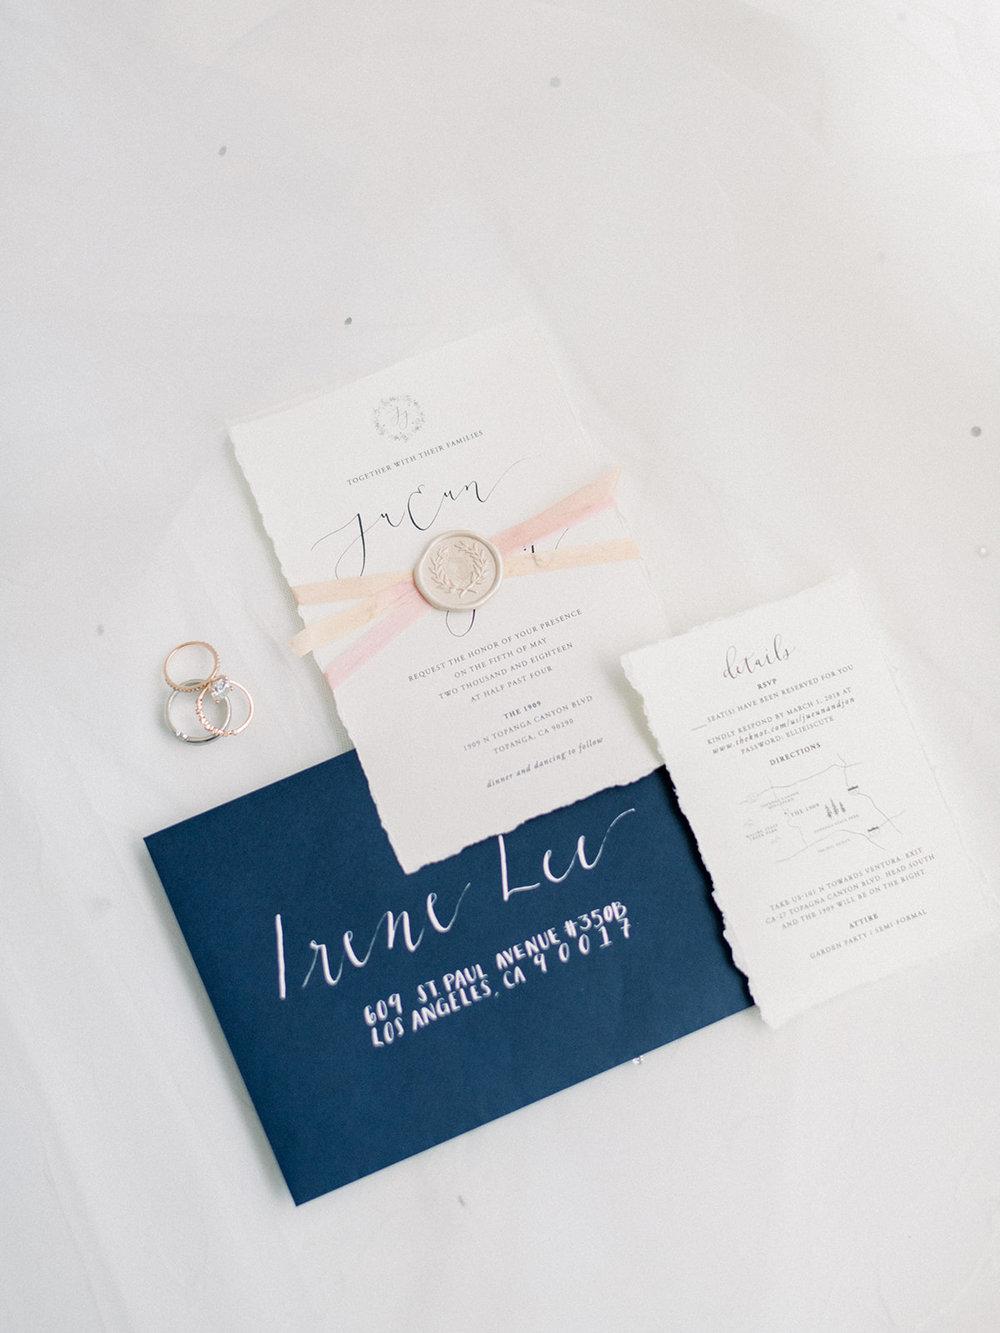 jueunandjon-etherandsmith-wedding-28.jpg